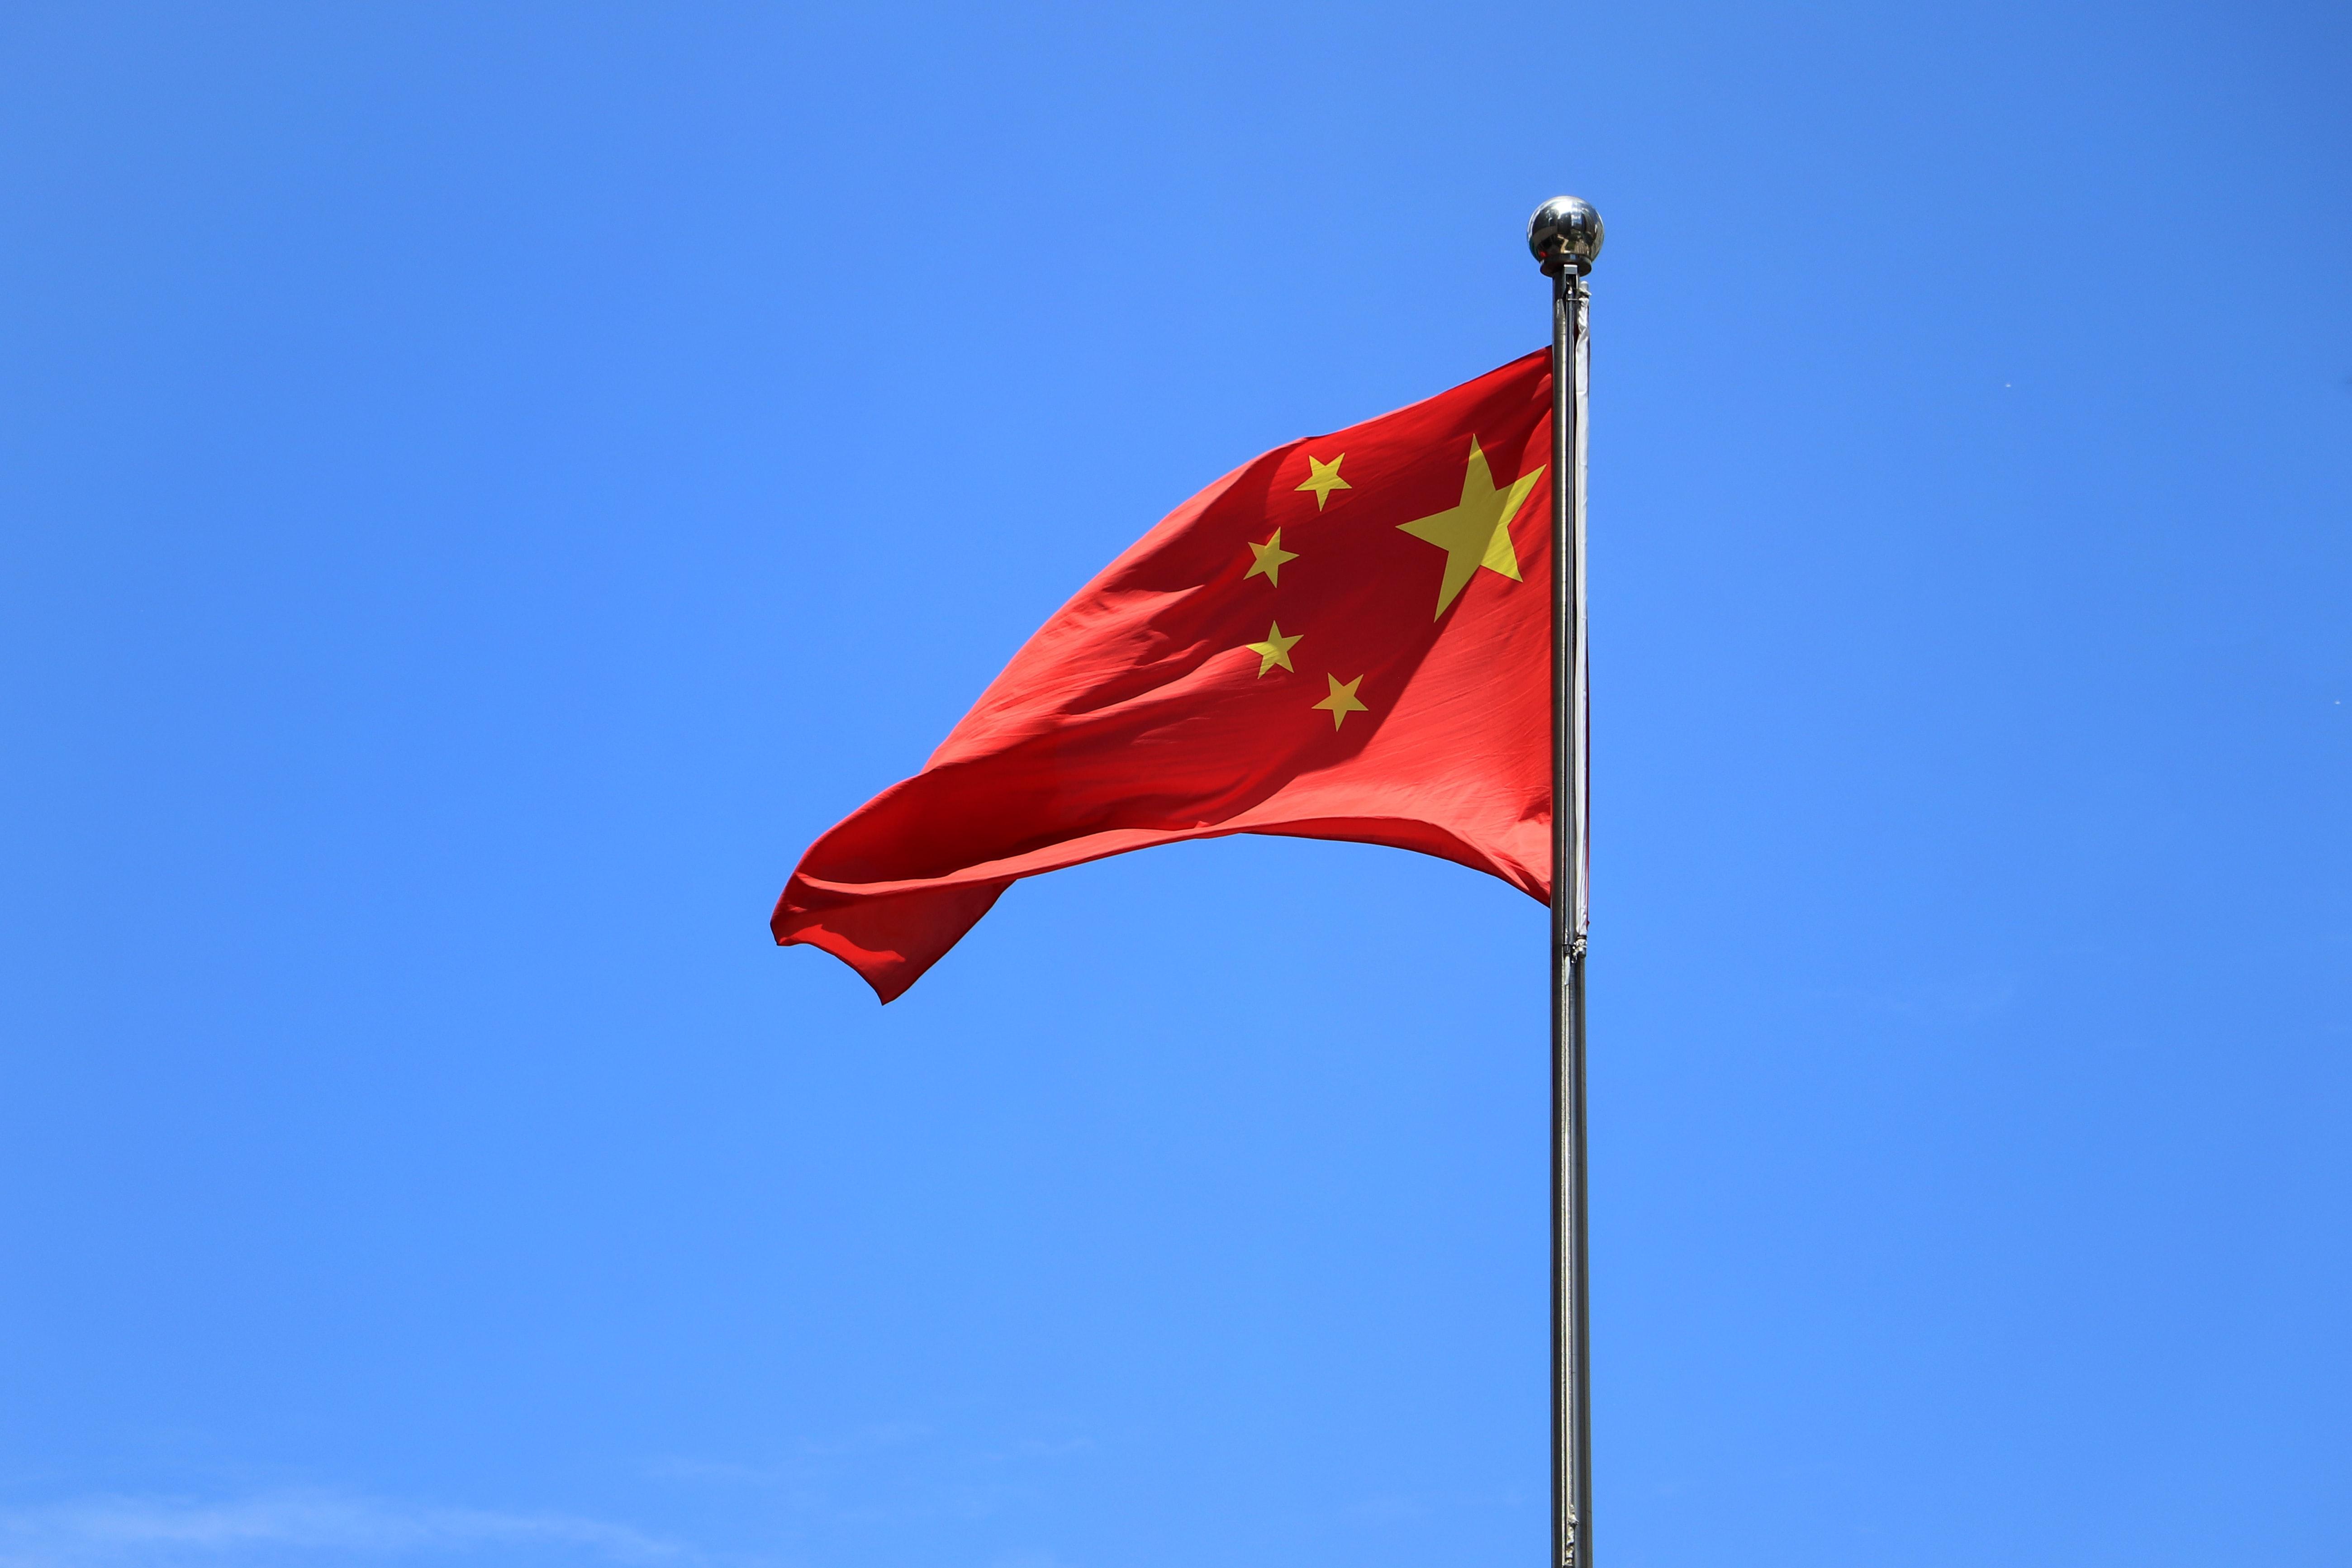 chinese-flag-photo-credit-macau-photo-agency